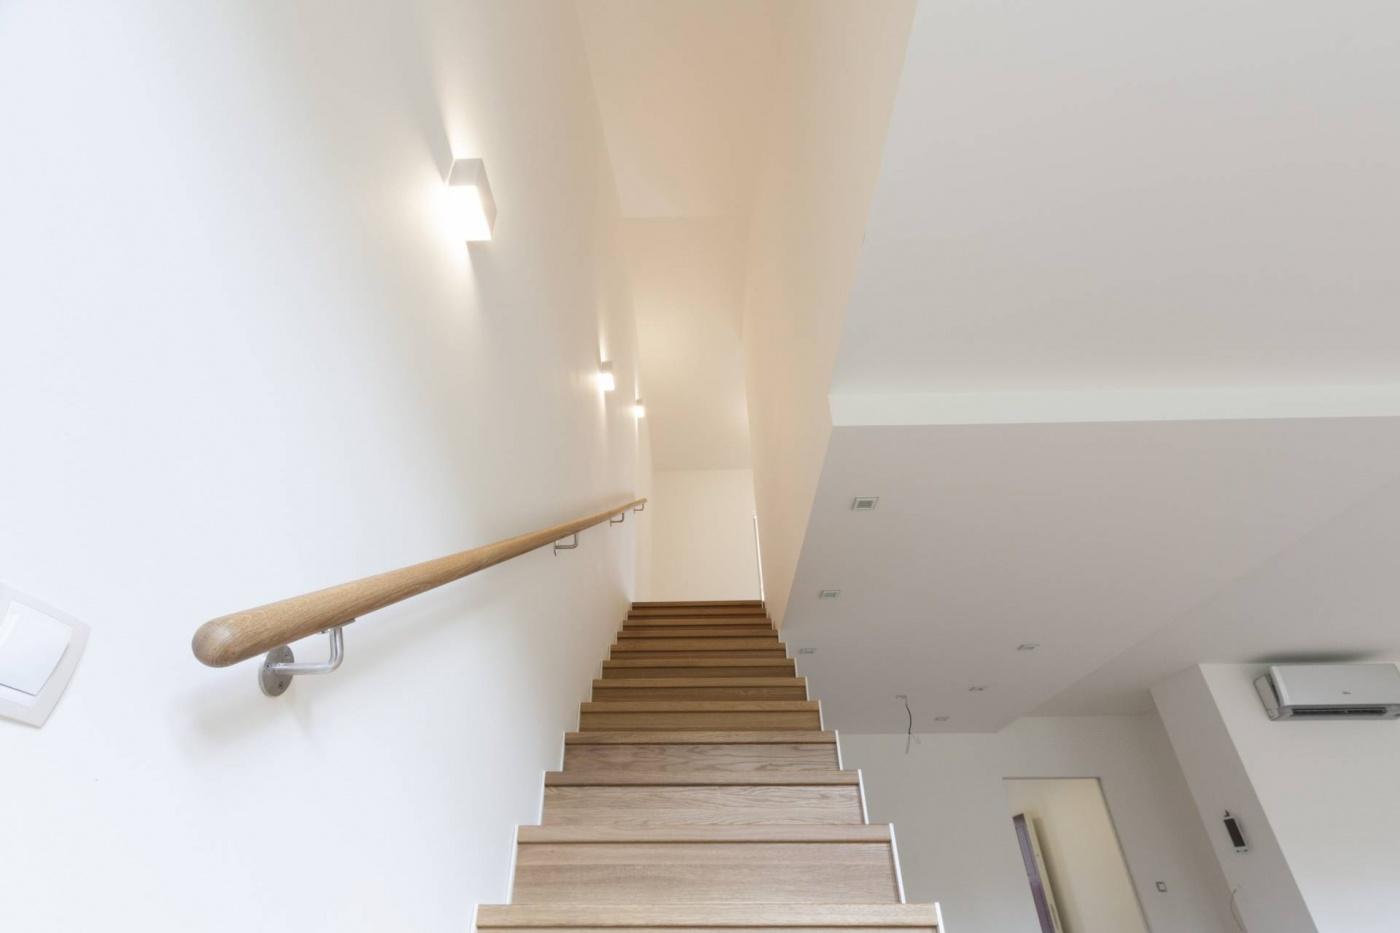 Půdní byt 3+kk, plocha 109 m², ulice Lumírova, Praha 2 - Vyšehrad | 19